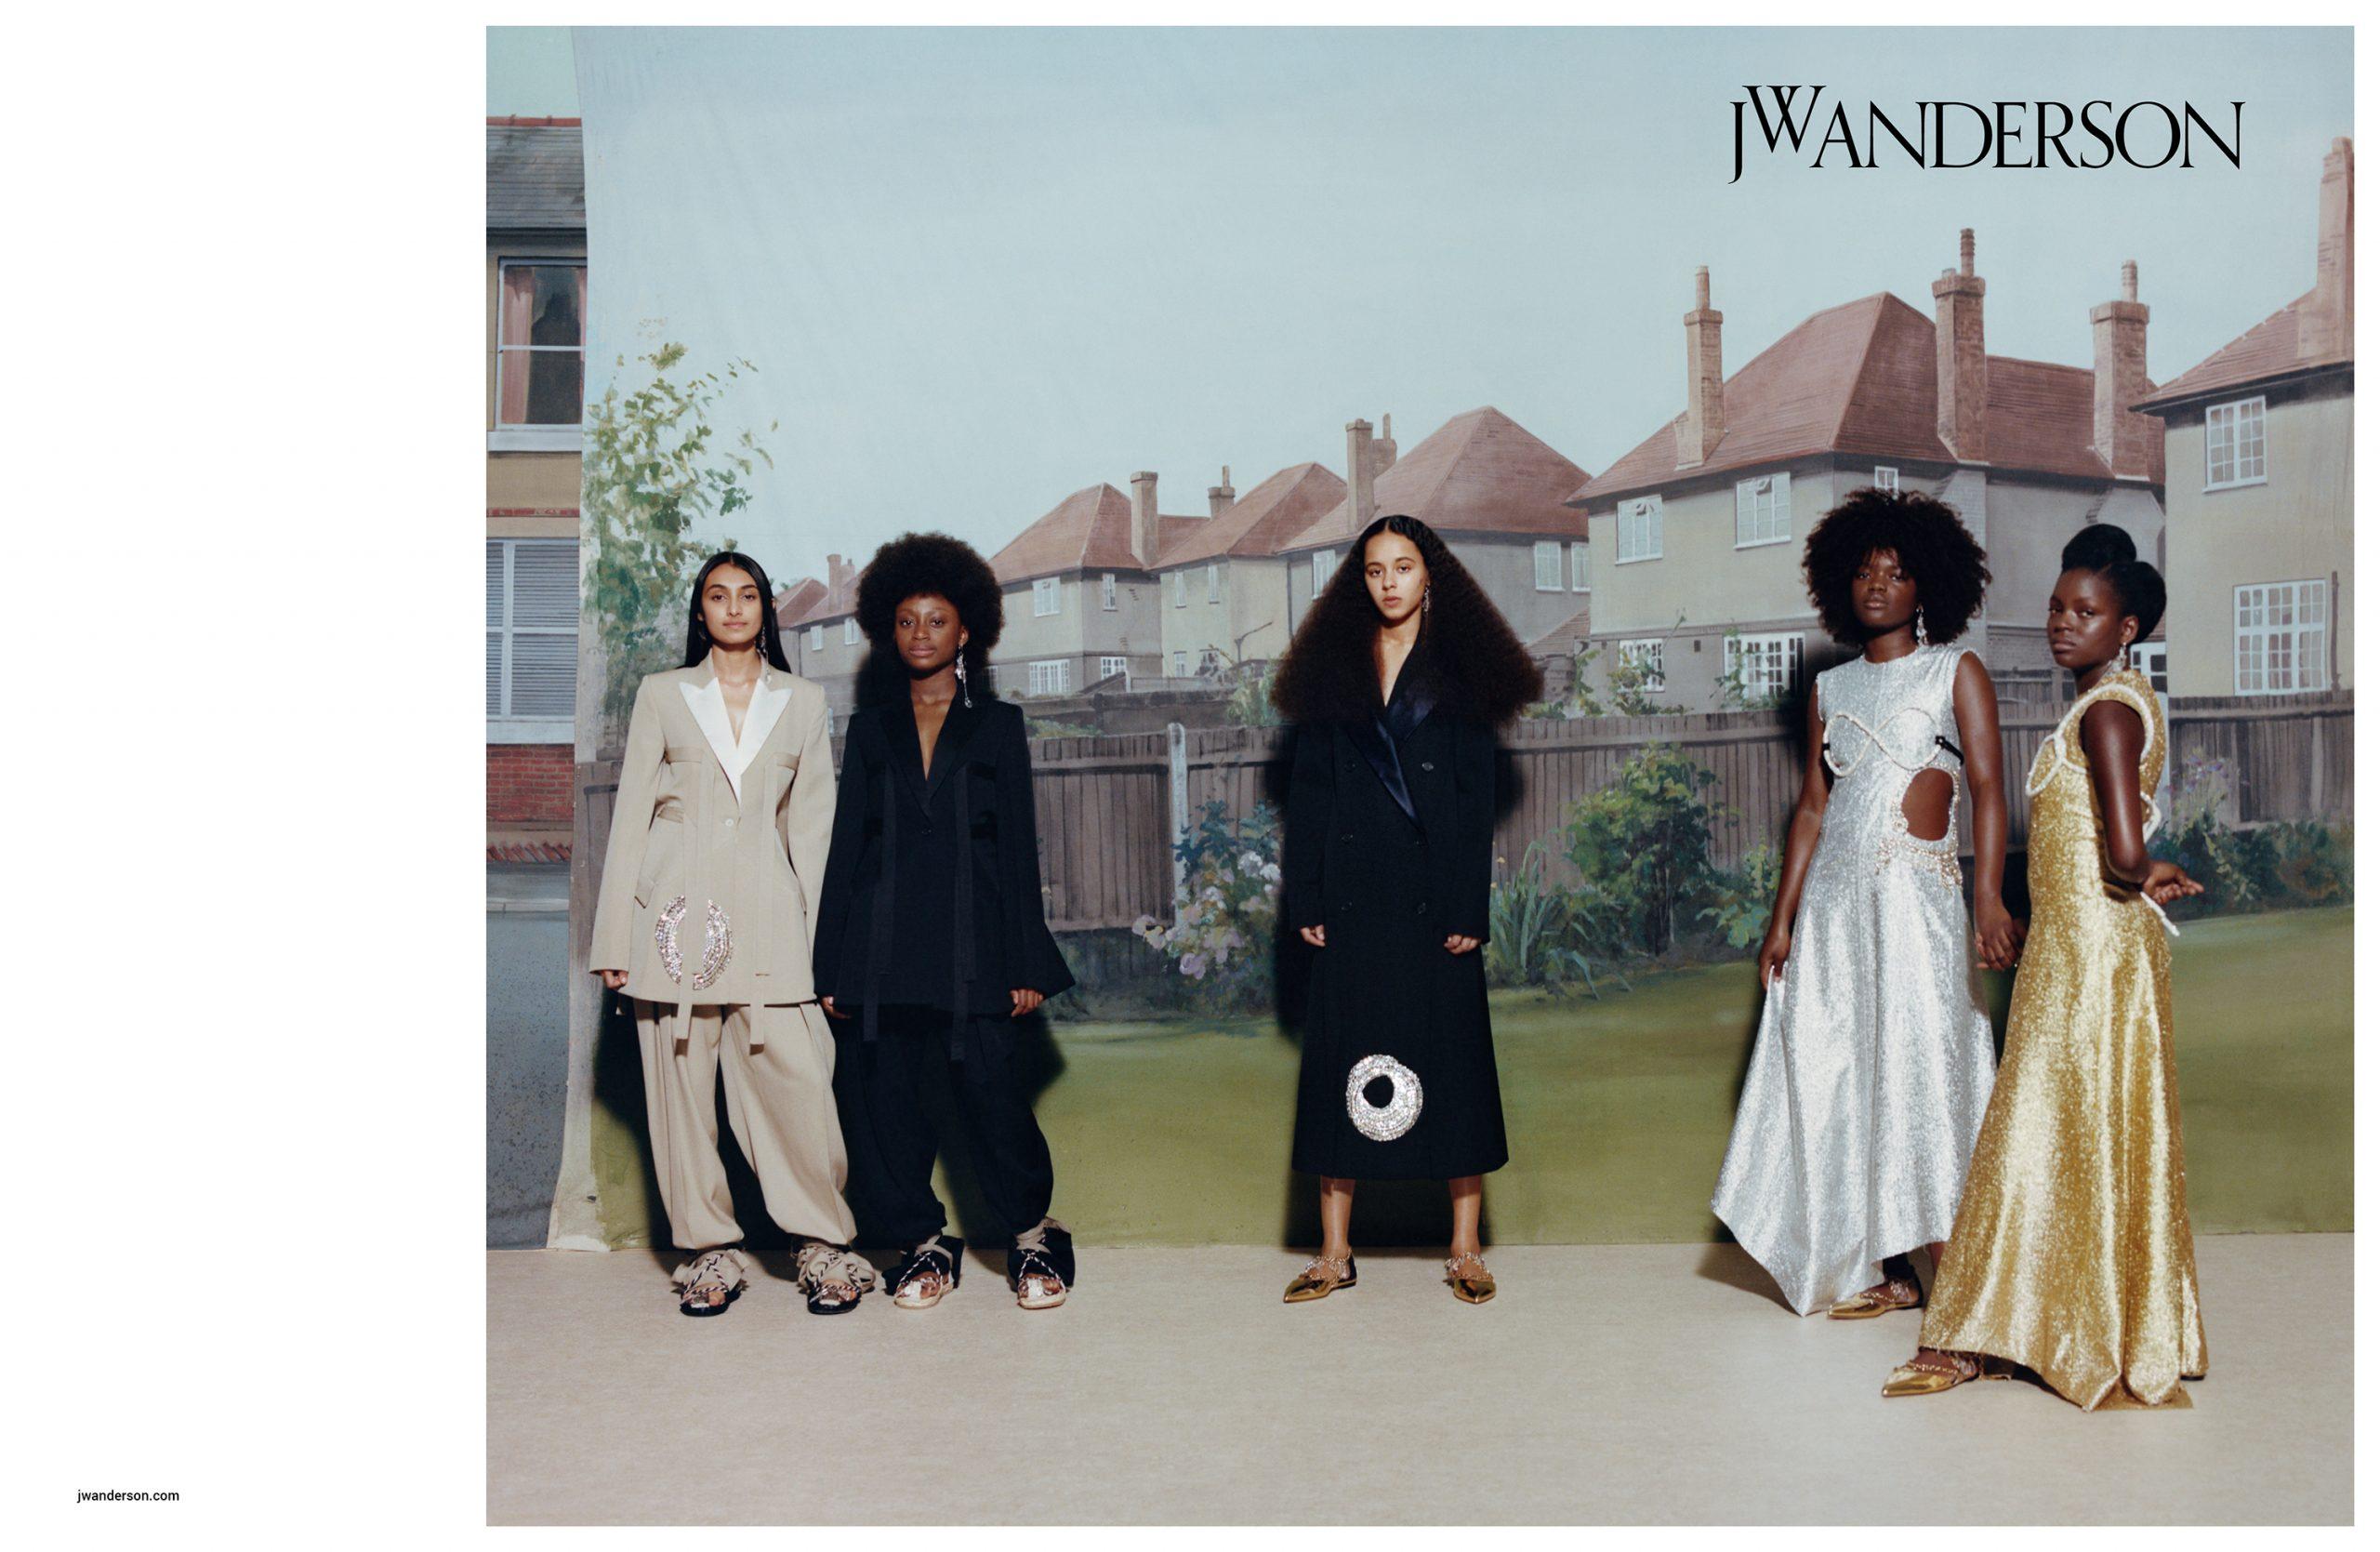 JW Anderson Spring 2020 Fashion Ad Campaign Photos